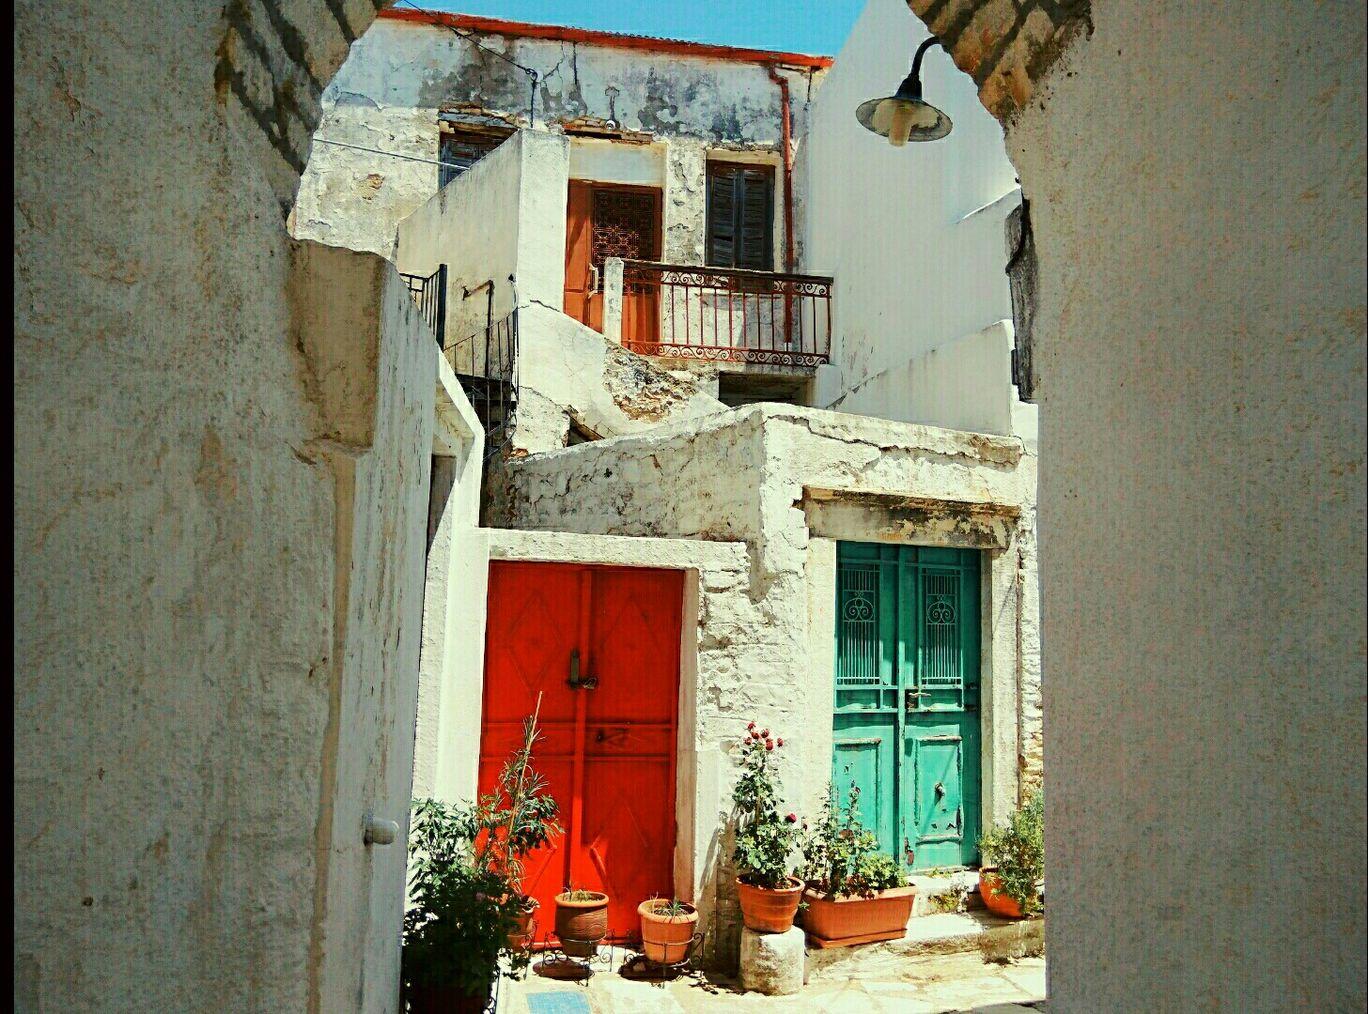 Photo of Greece By vikrant jamdar